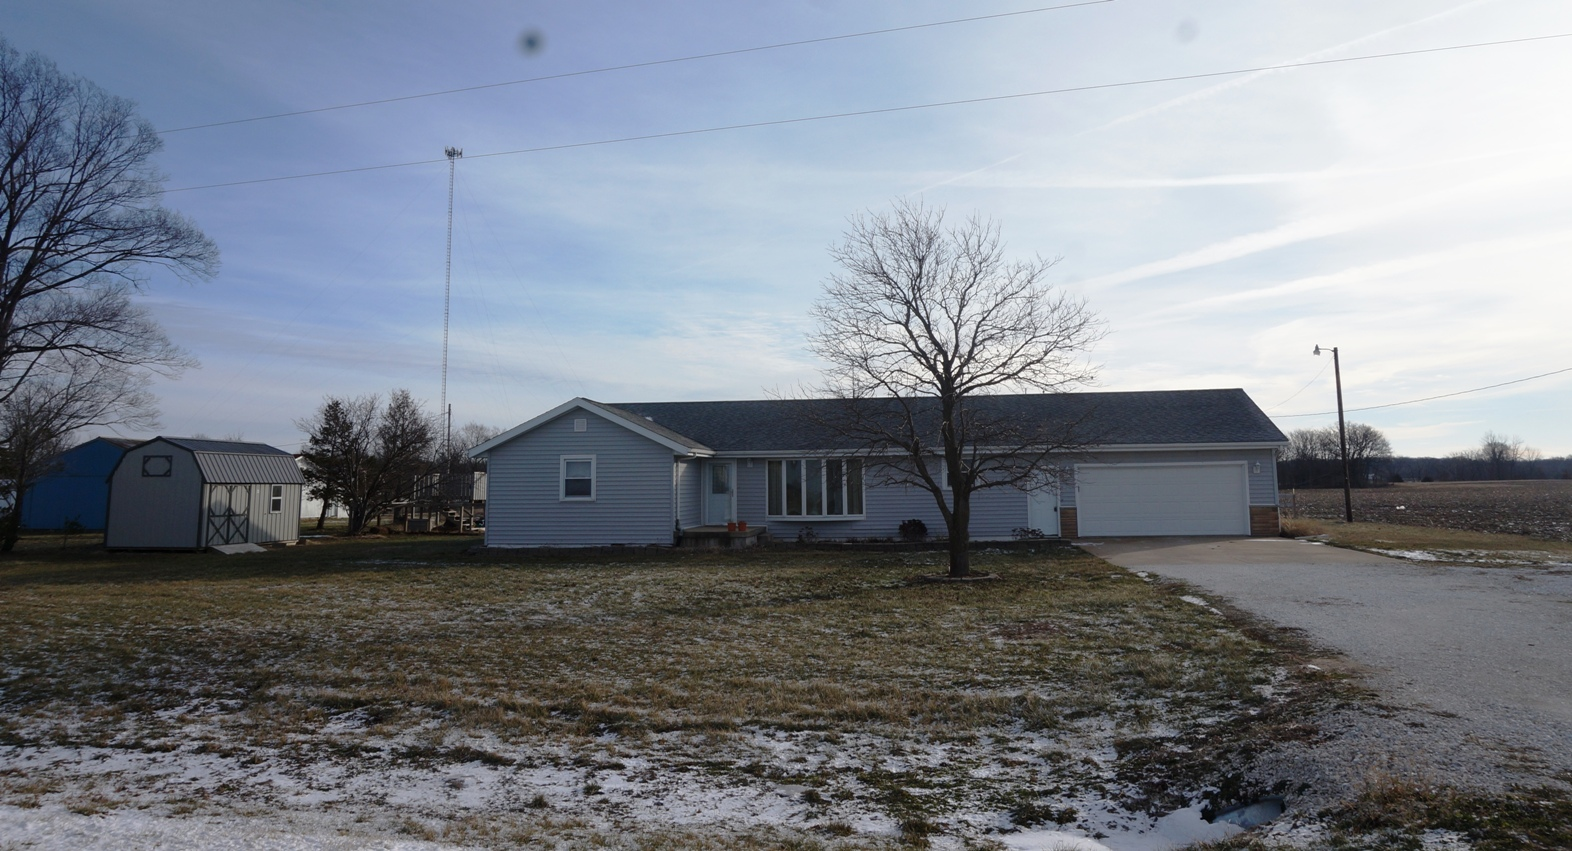 RR 1 Box 401, Greenfield, Illinois 62044